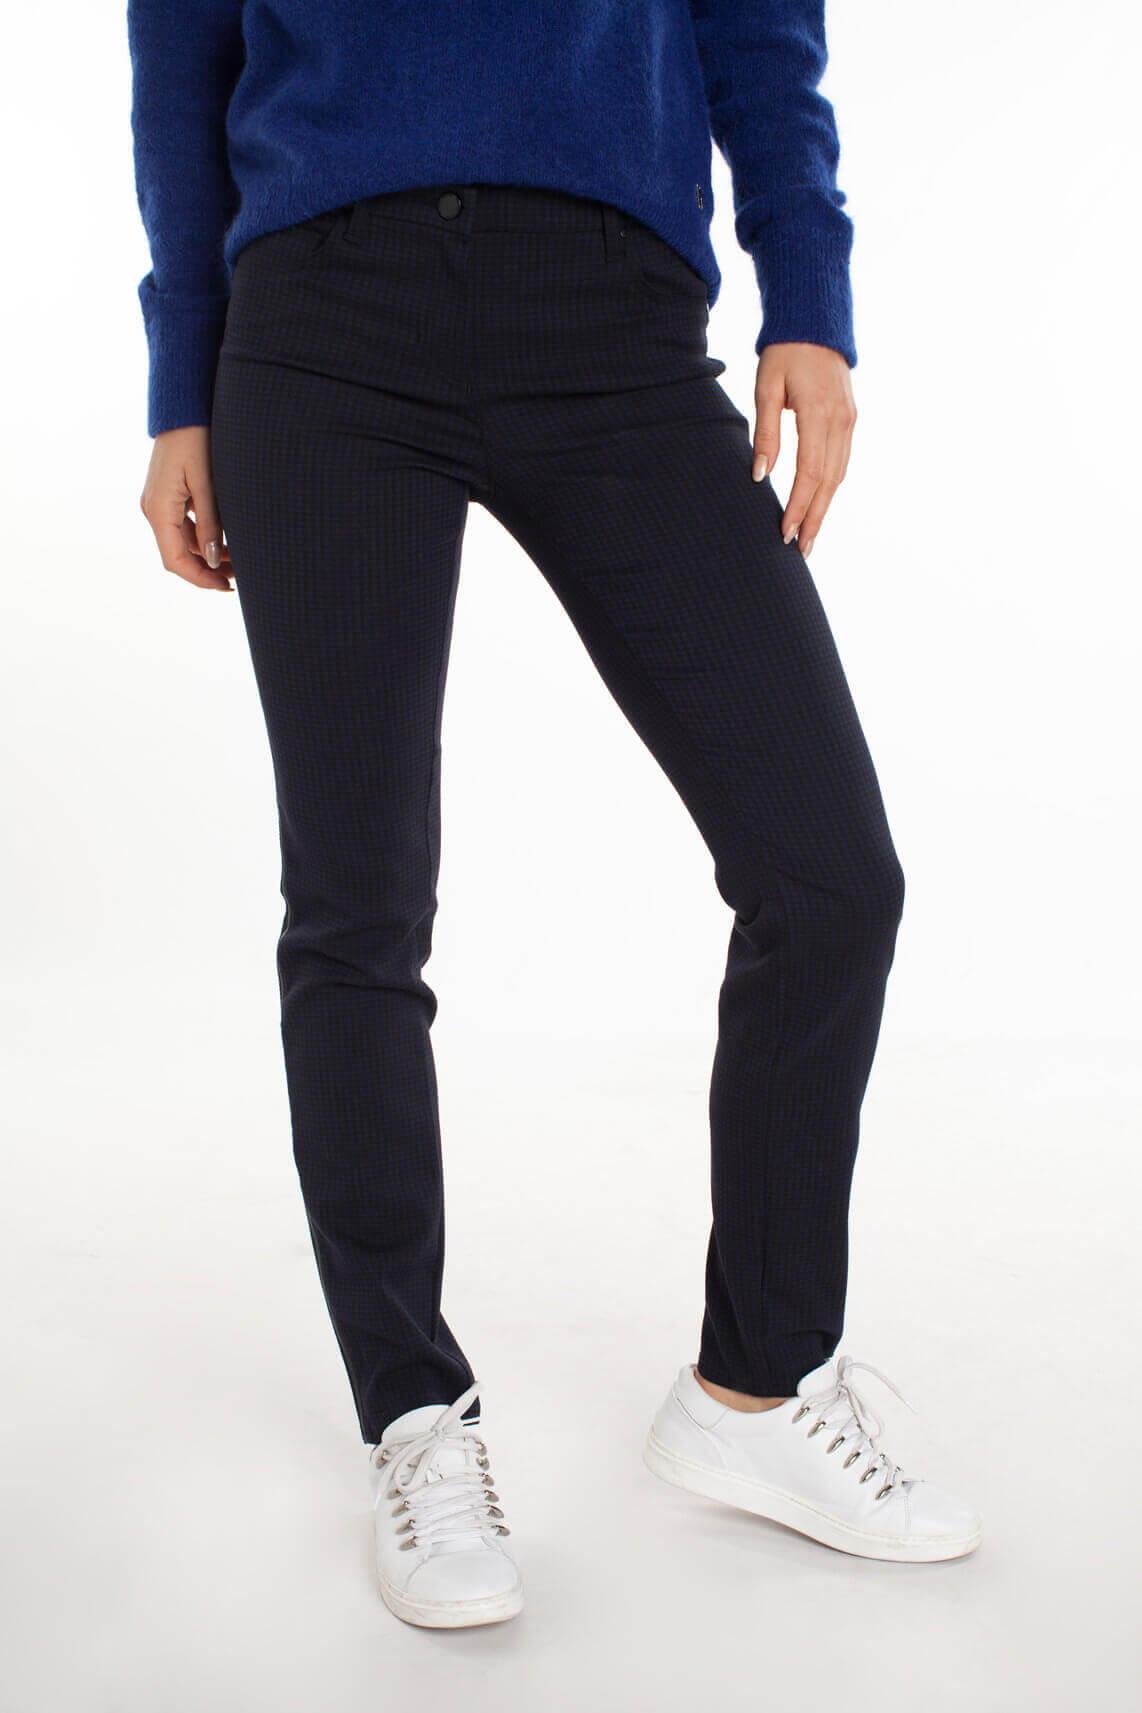 Rosner Dames Antonia broek met print Blauw